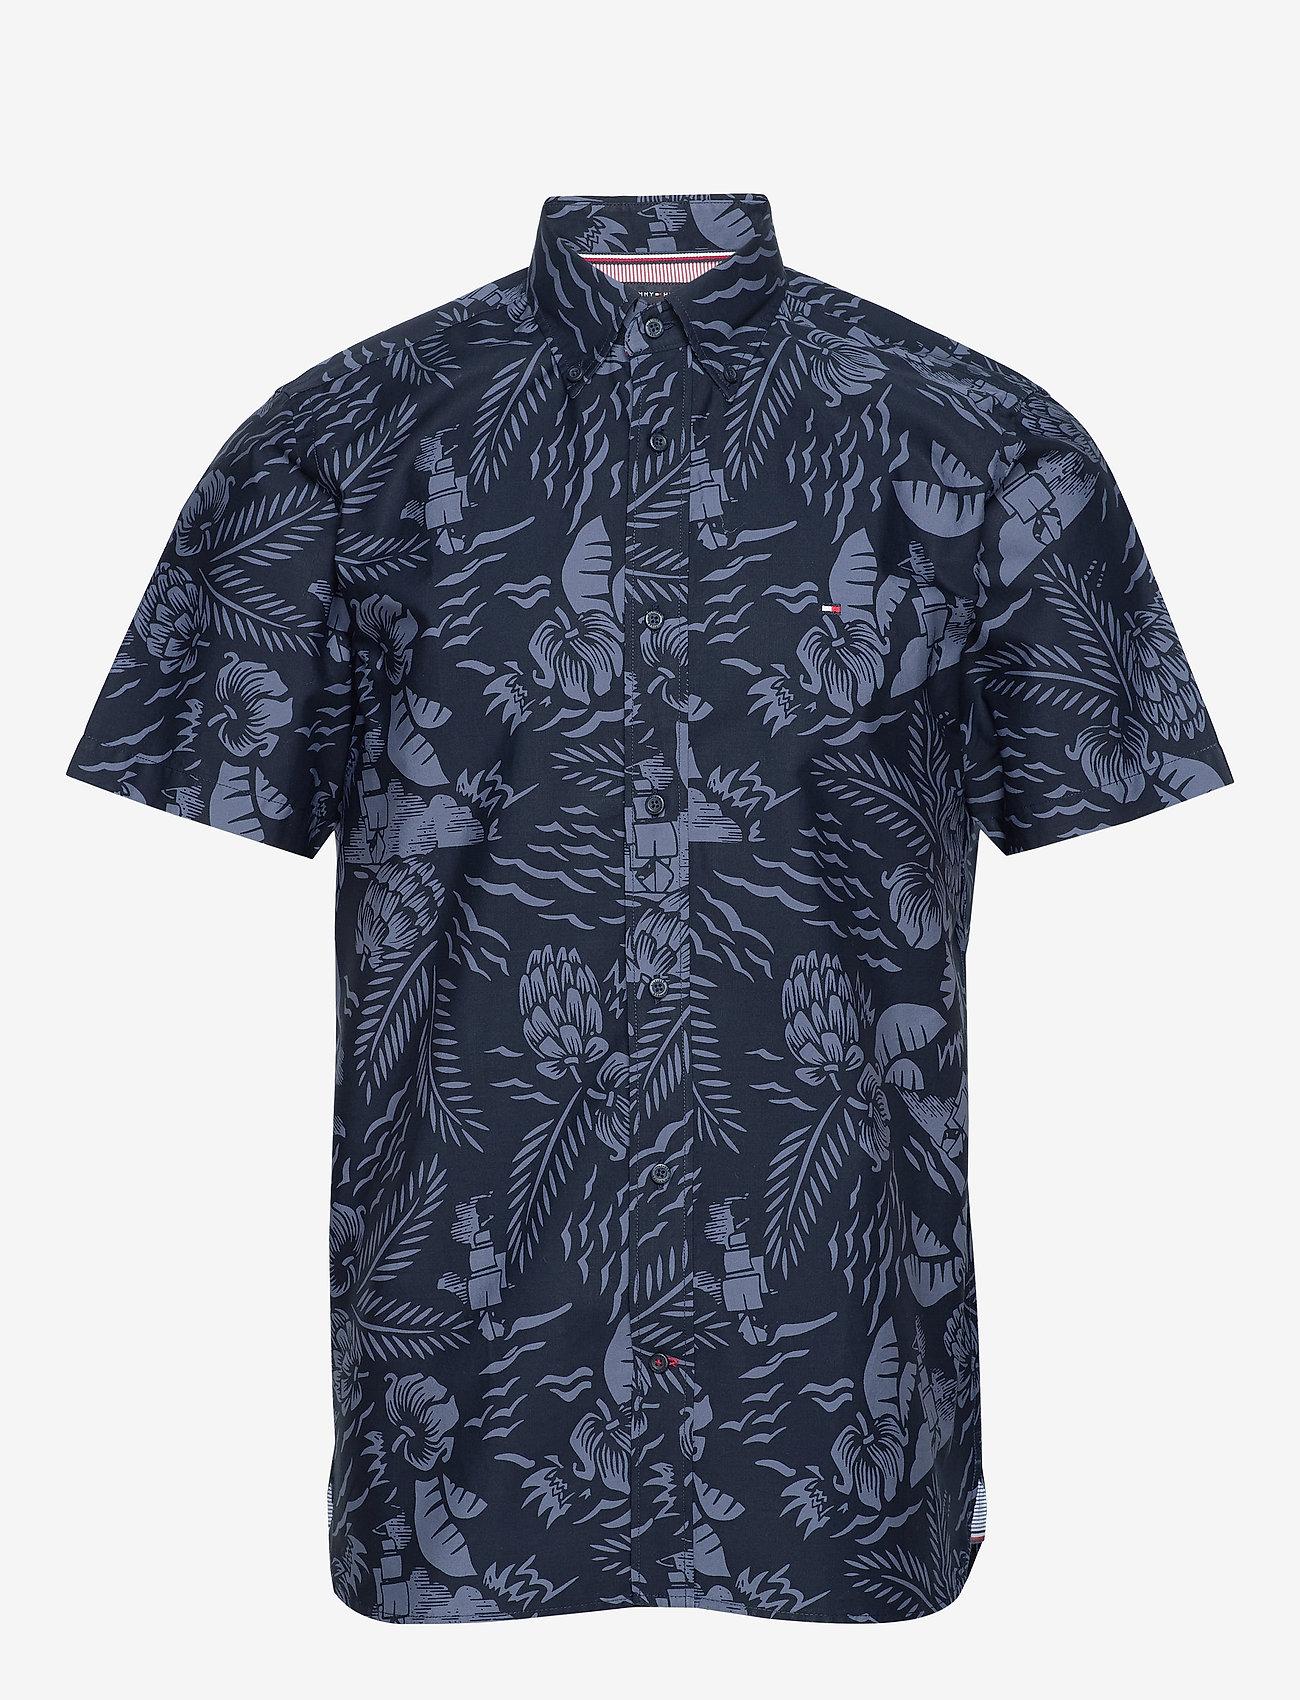 Tommy Hilfiger - LARGE SEASONAL PRINT - short-sleeved shirts - desert sky / faded indigo - 0